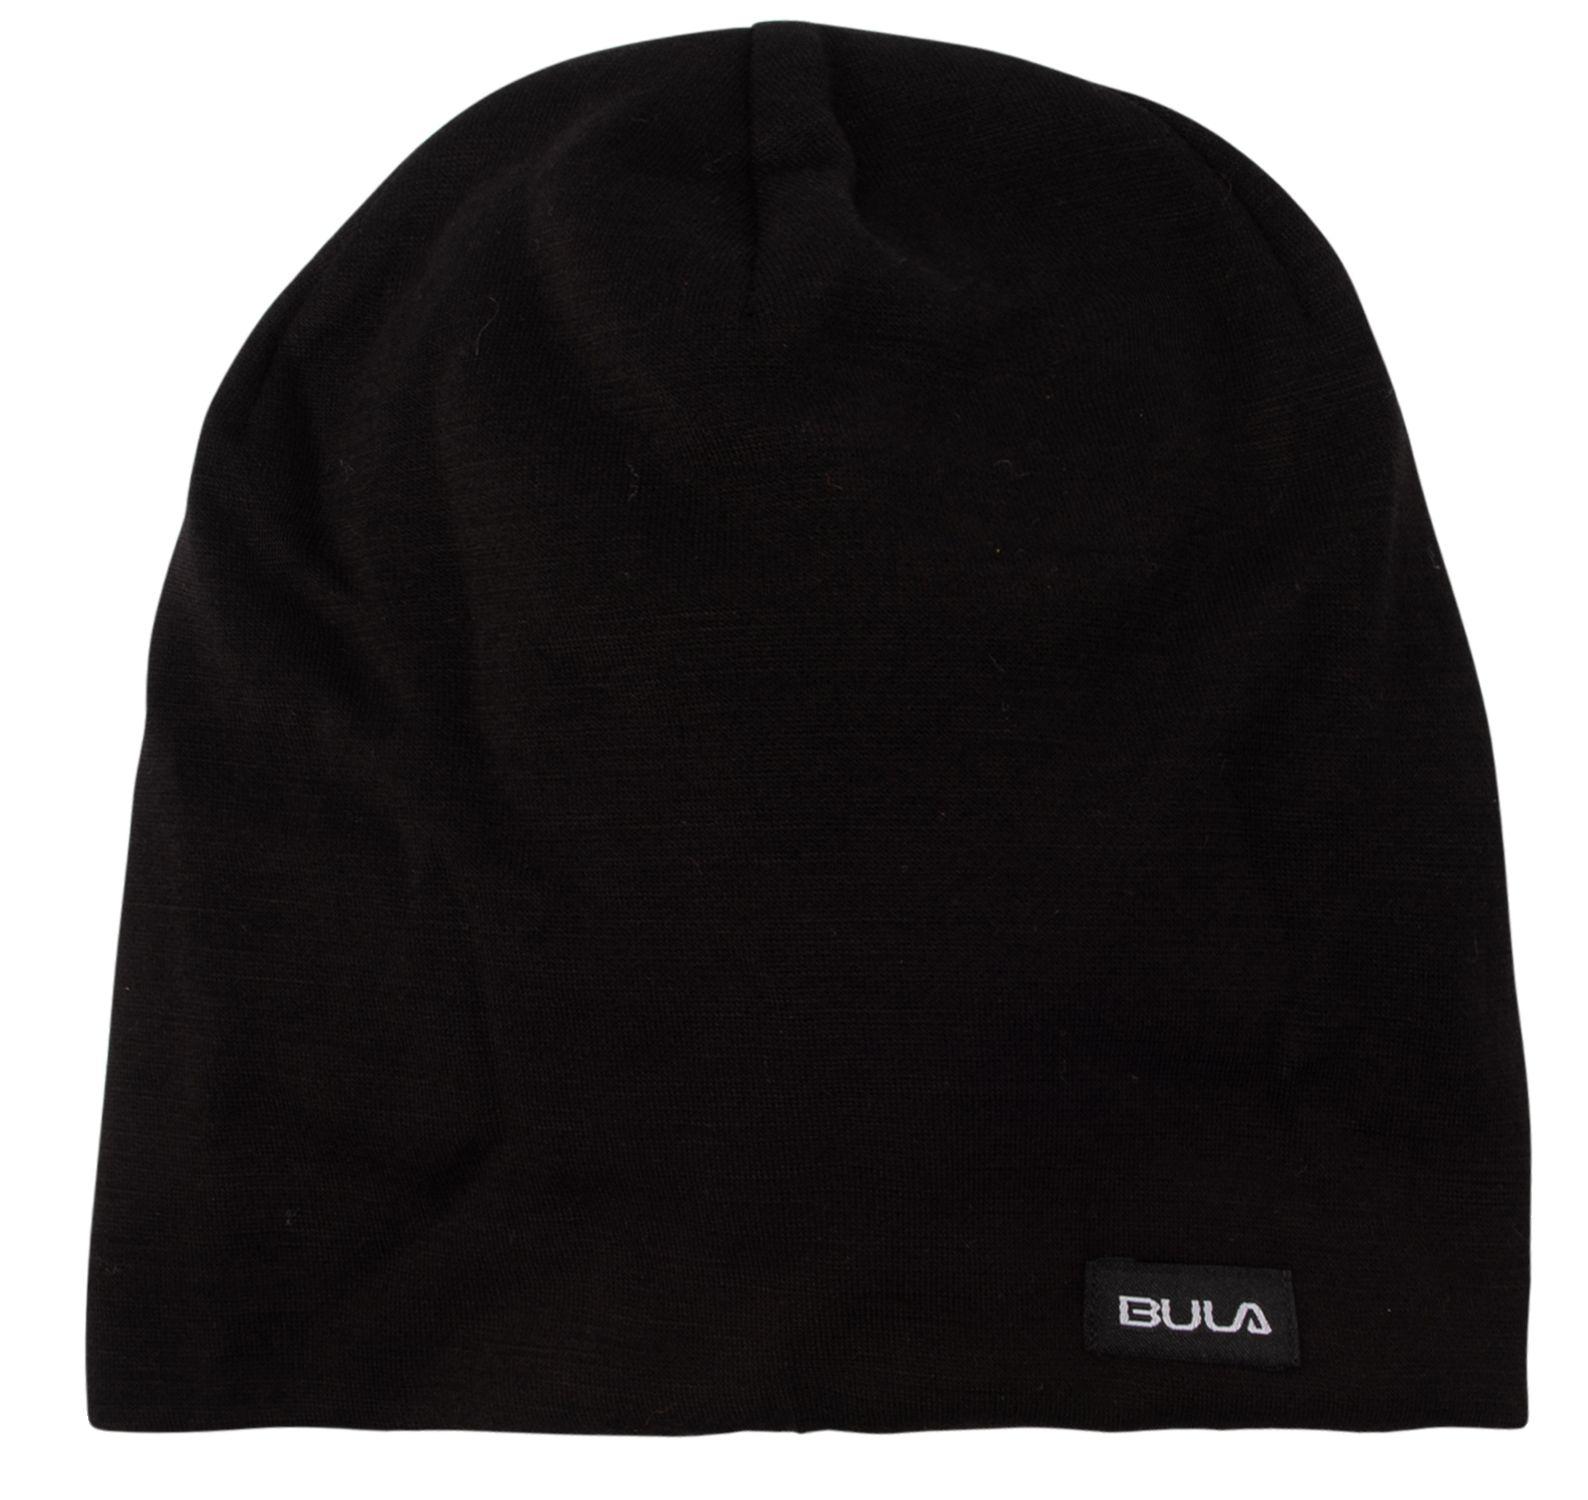 Camo Printed Wool Beanie, Black, Onesize,  Bula